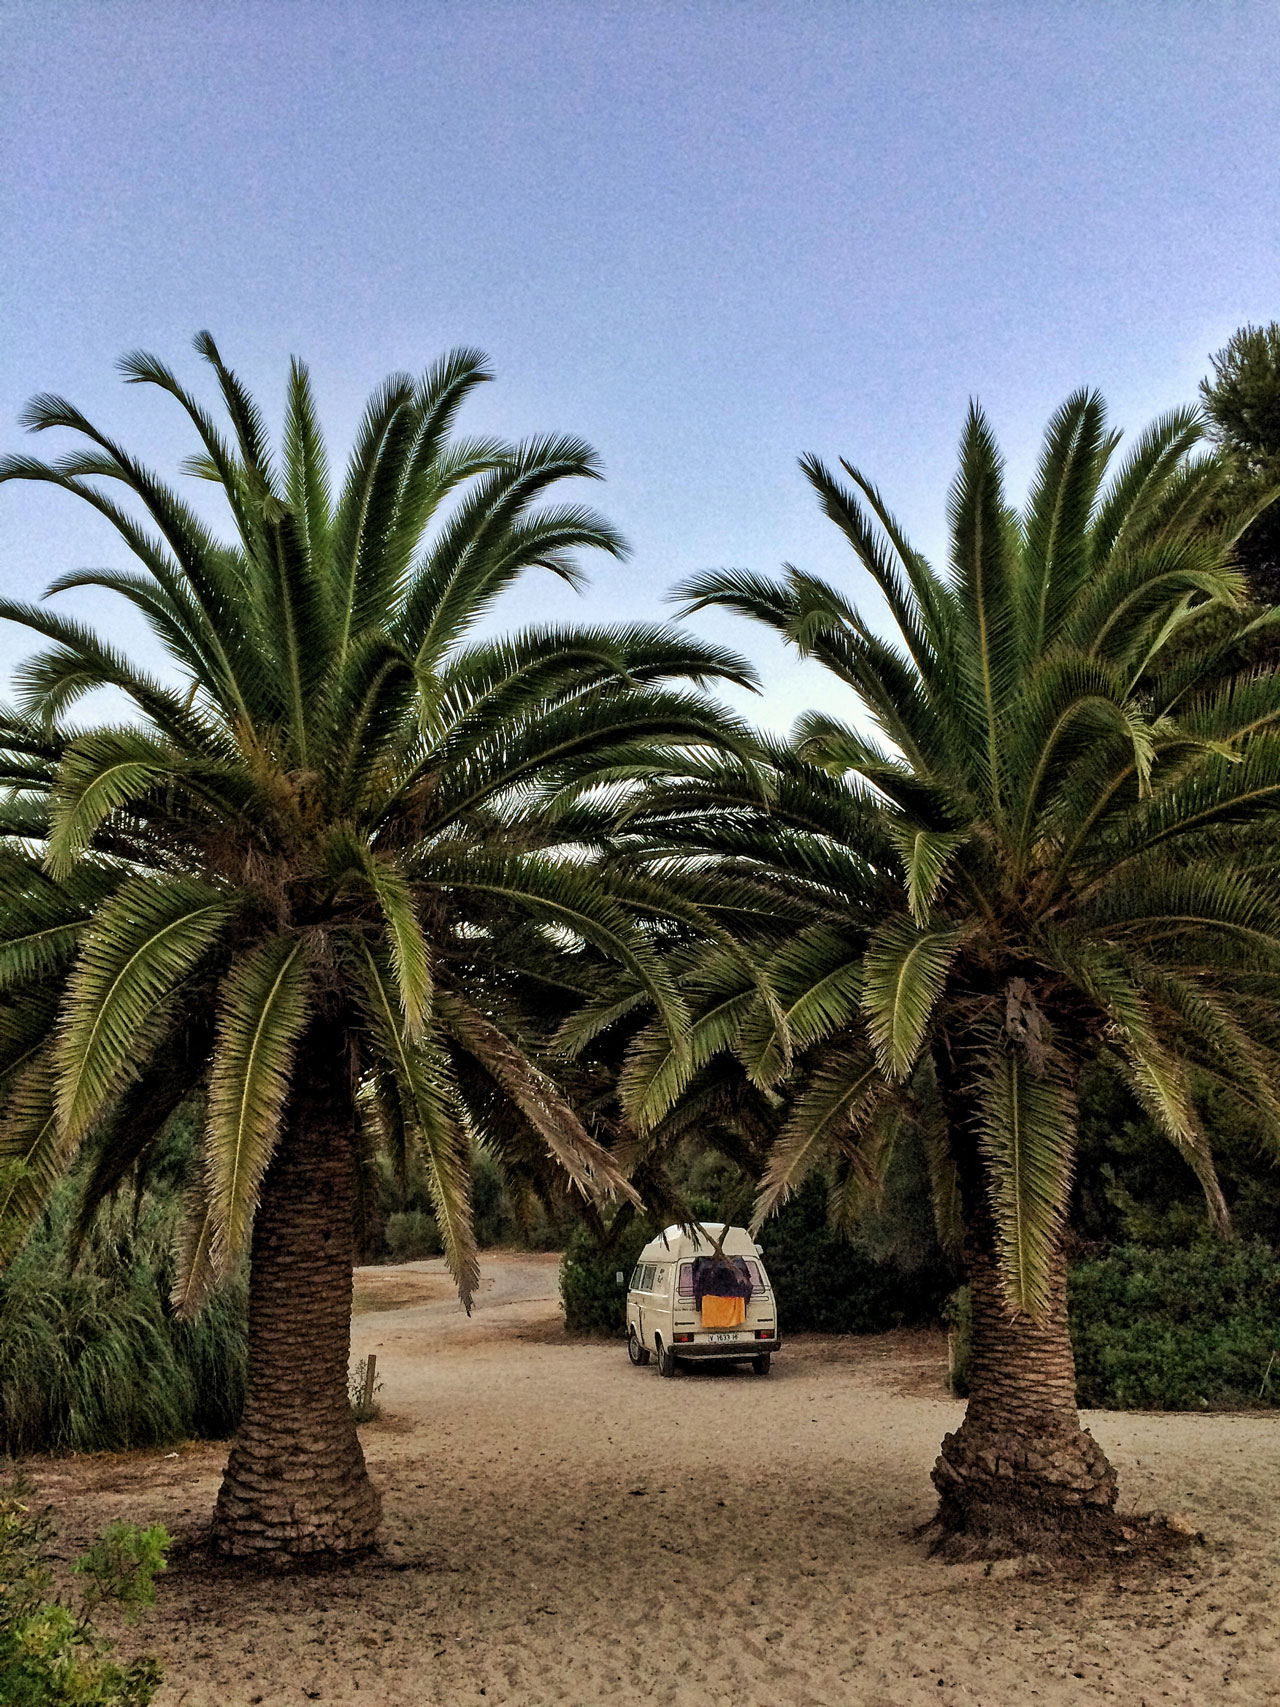 Unser lauschiges Plätzchen, neben den zwei riesigen Palmen auf Mallorca.